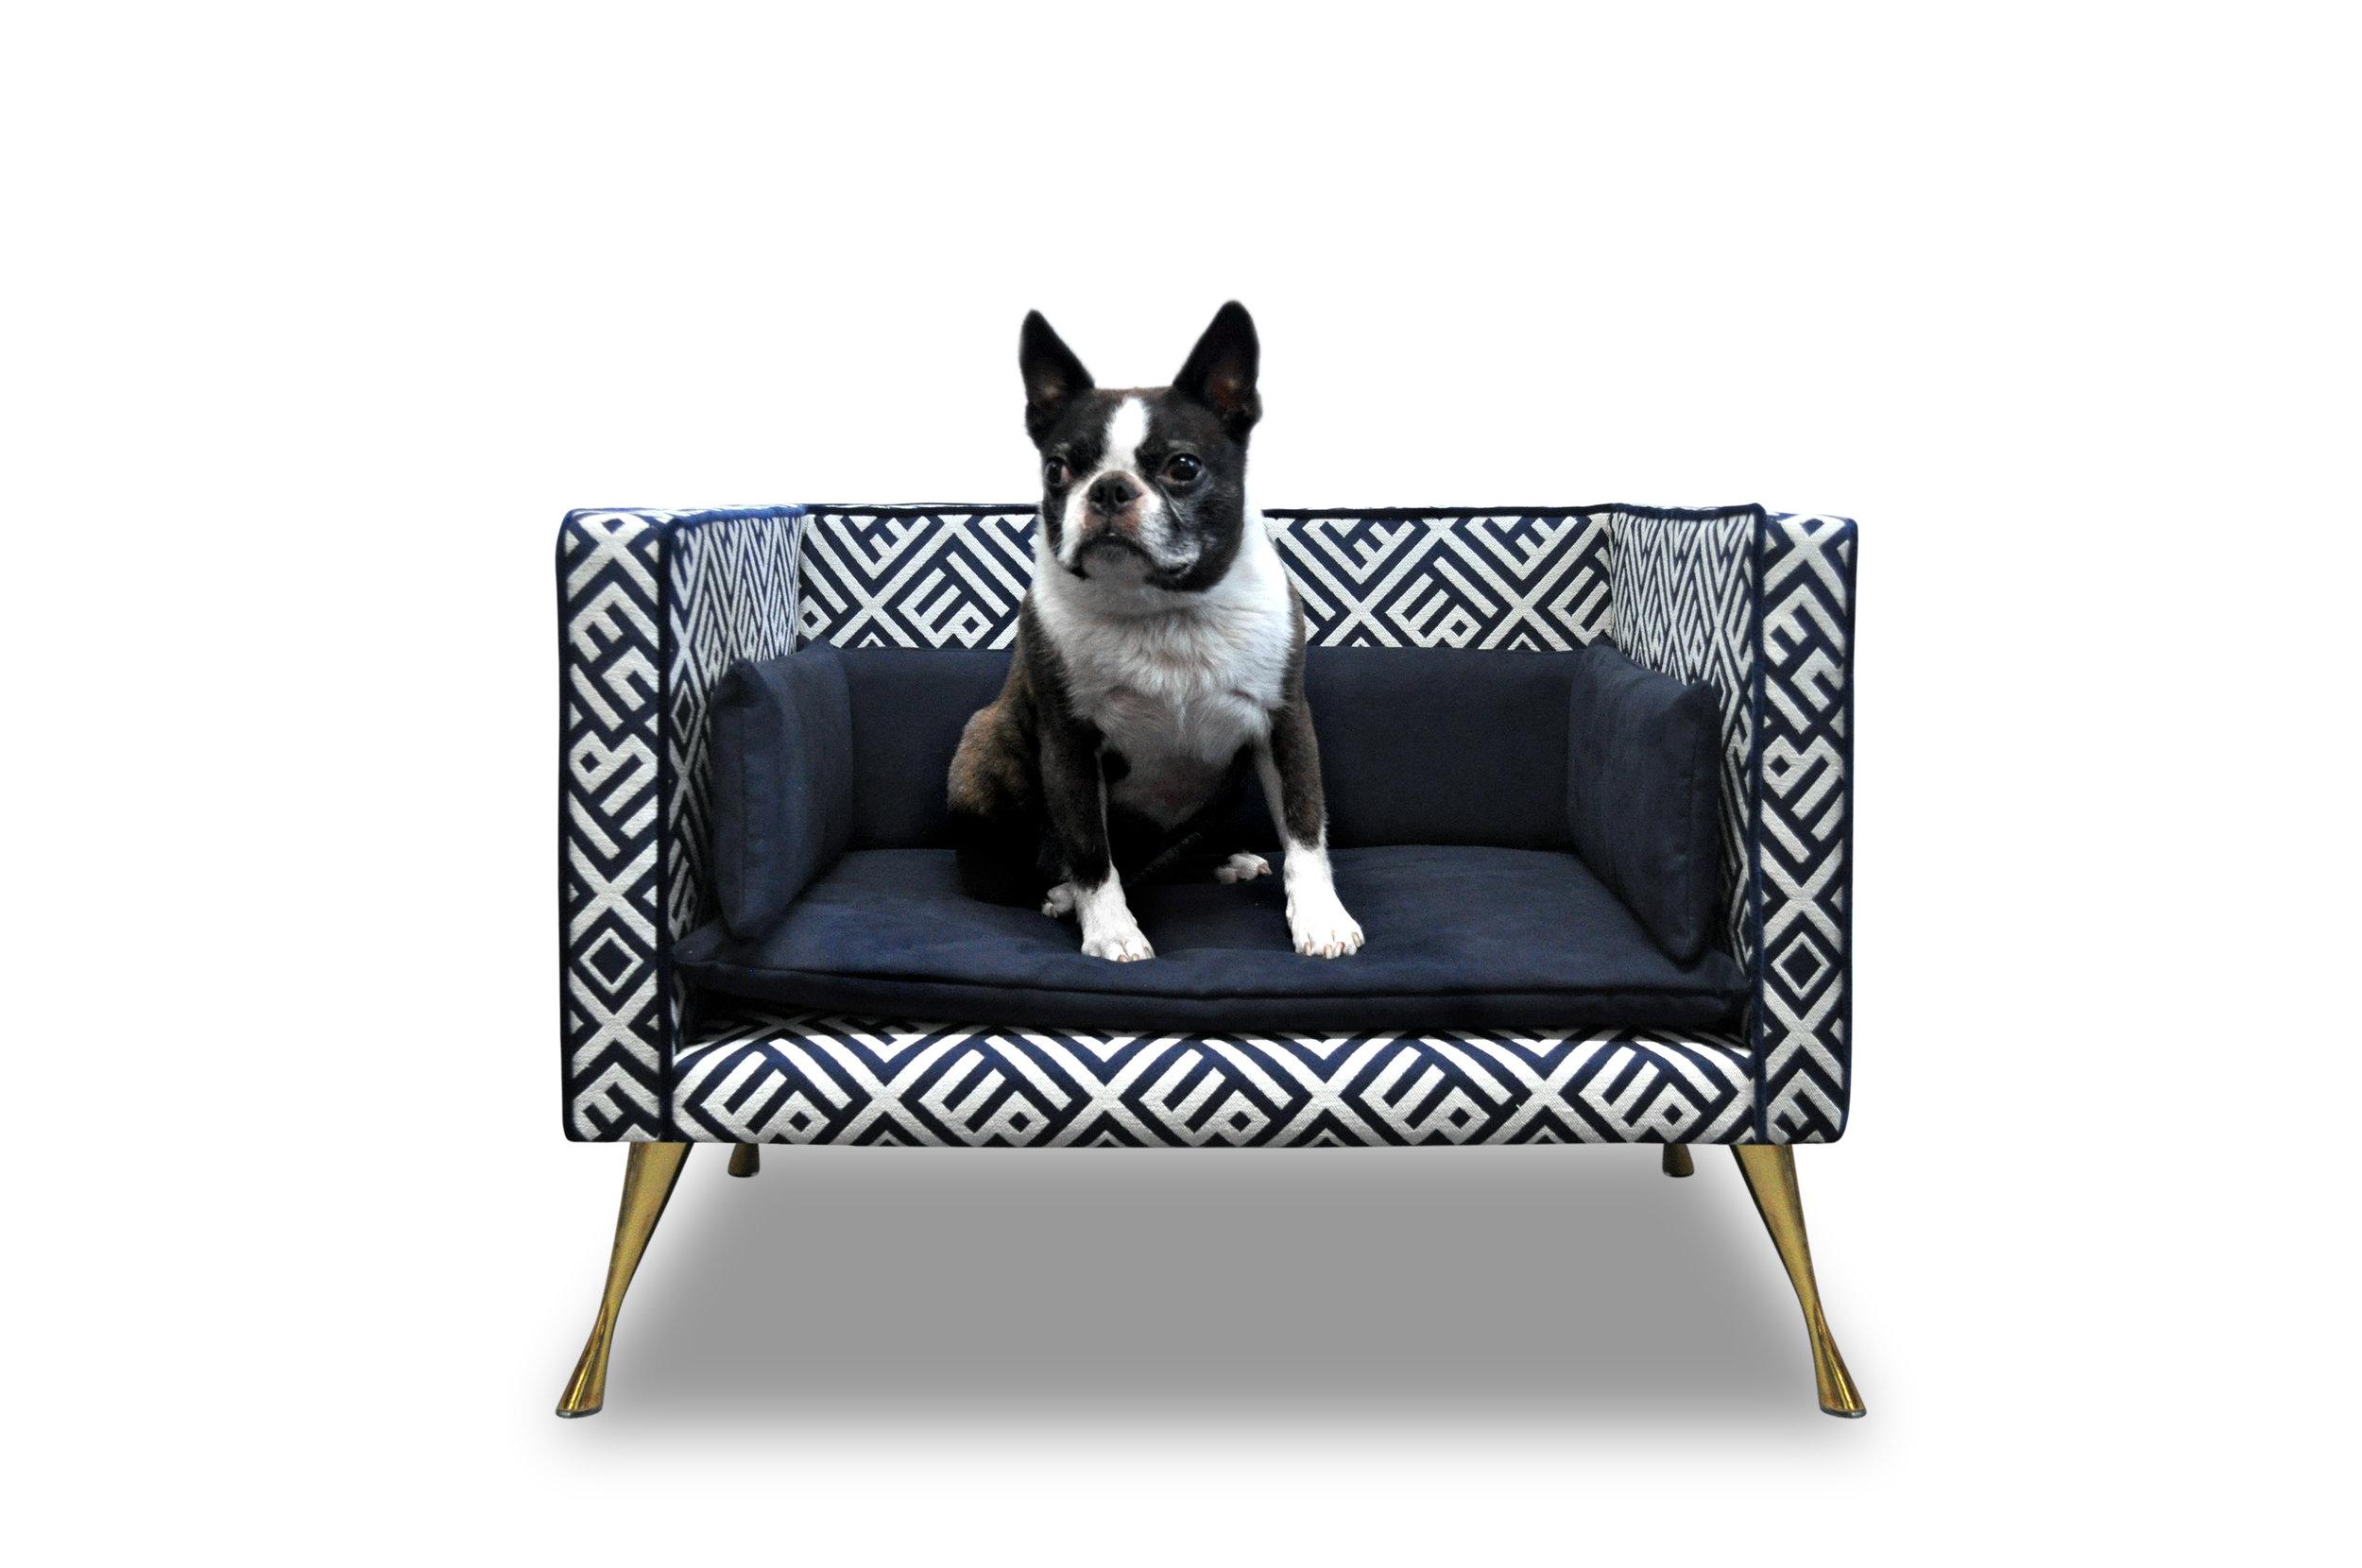 Interiors Advent Calendar - Luxurious dog bed by Savoir Beds - Masha Shapiro Agency UK.jpg